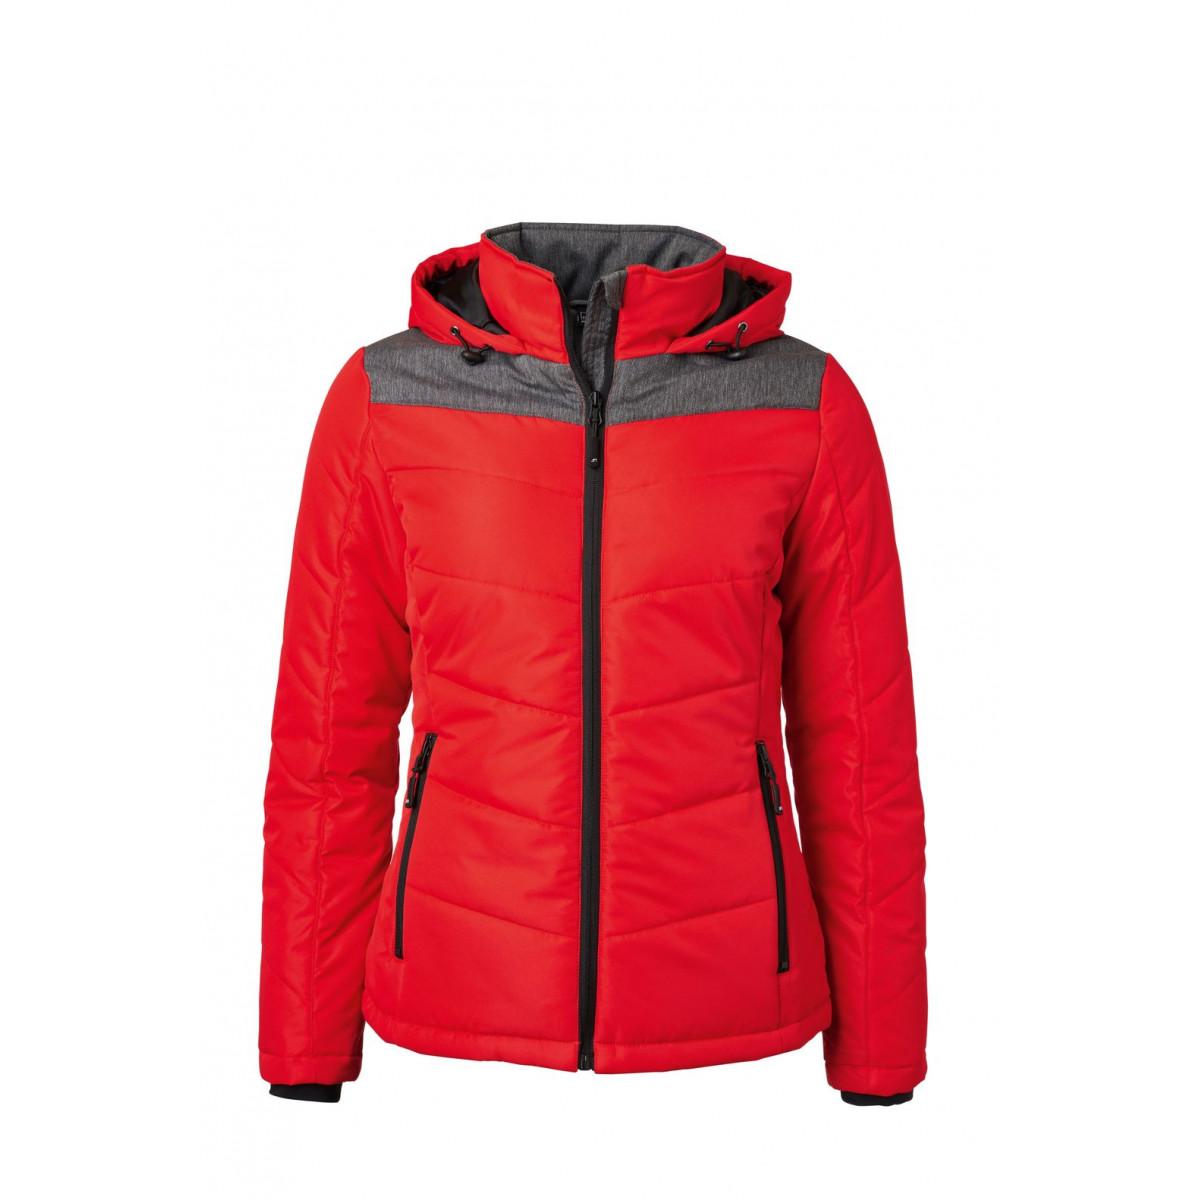 Куртка женская JN1133 Ladies Winter Jacket - Красный/Темно-серый меланж